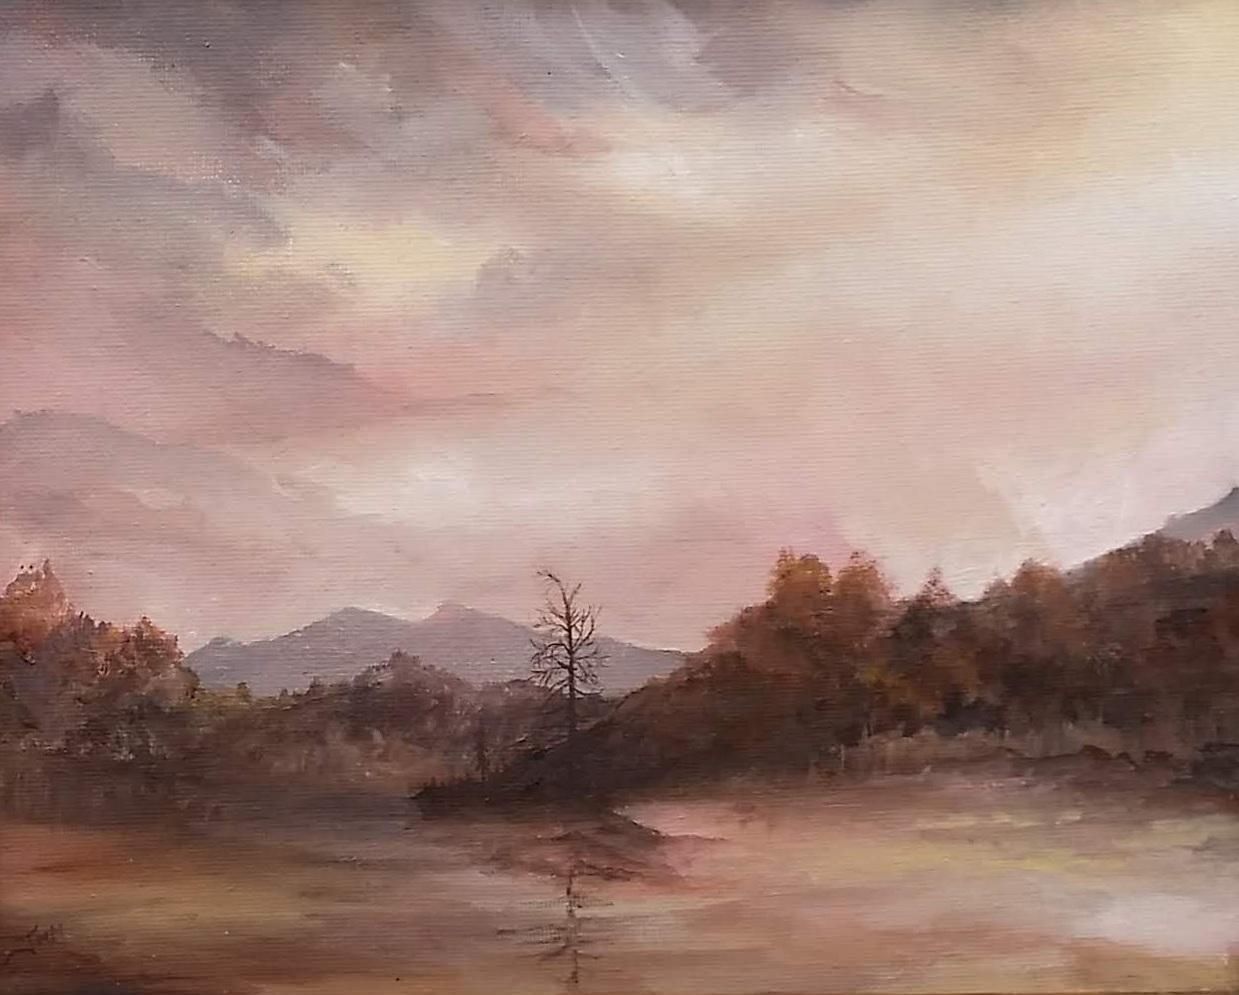 "Ticonderoga Ferry Ride | 2018 | SOLD  Oil on canvas, 10"" x 8"" (11"" x 9"" framed)"